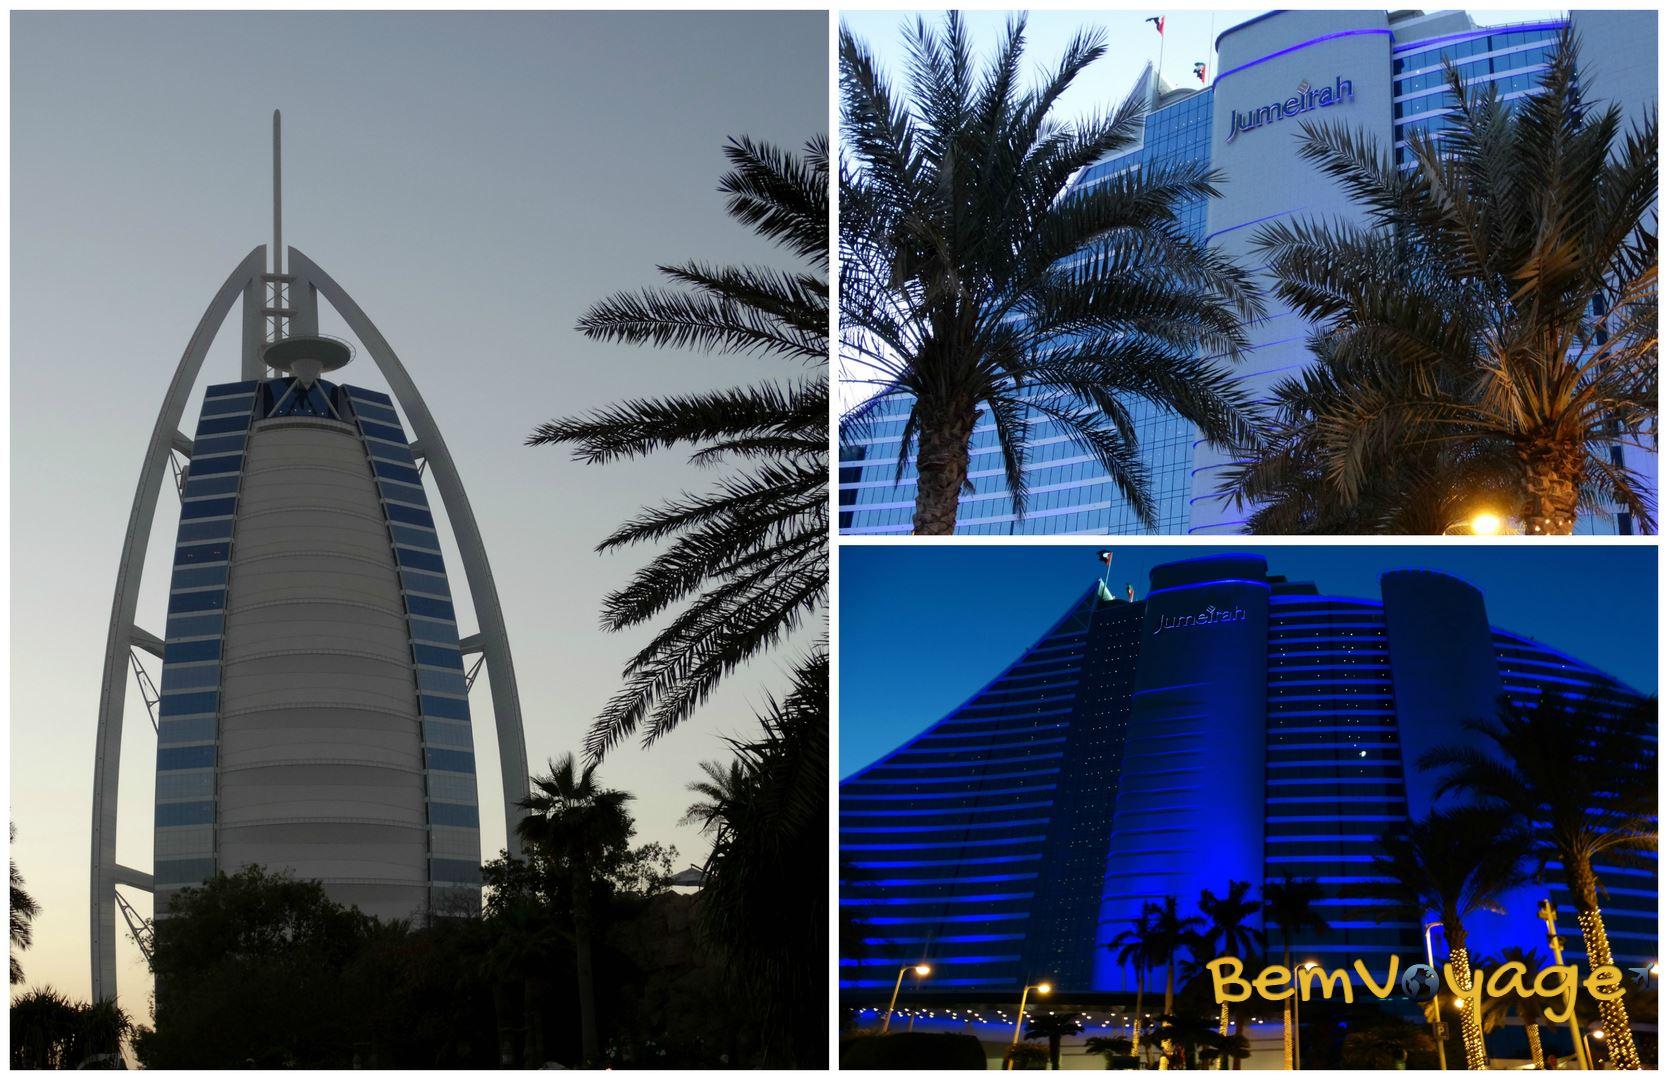 jumeirah hotel logo